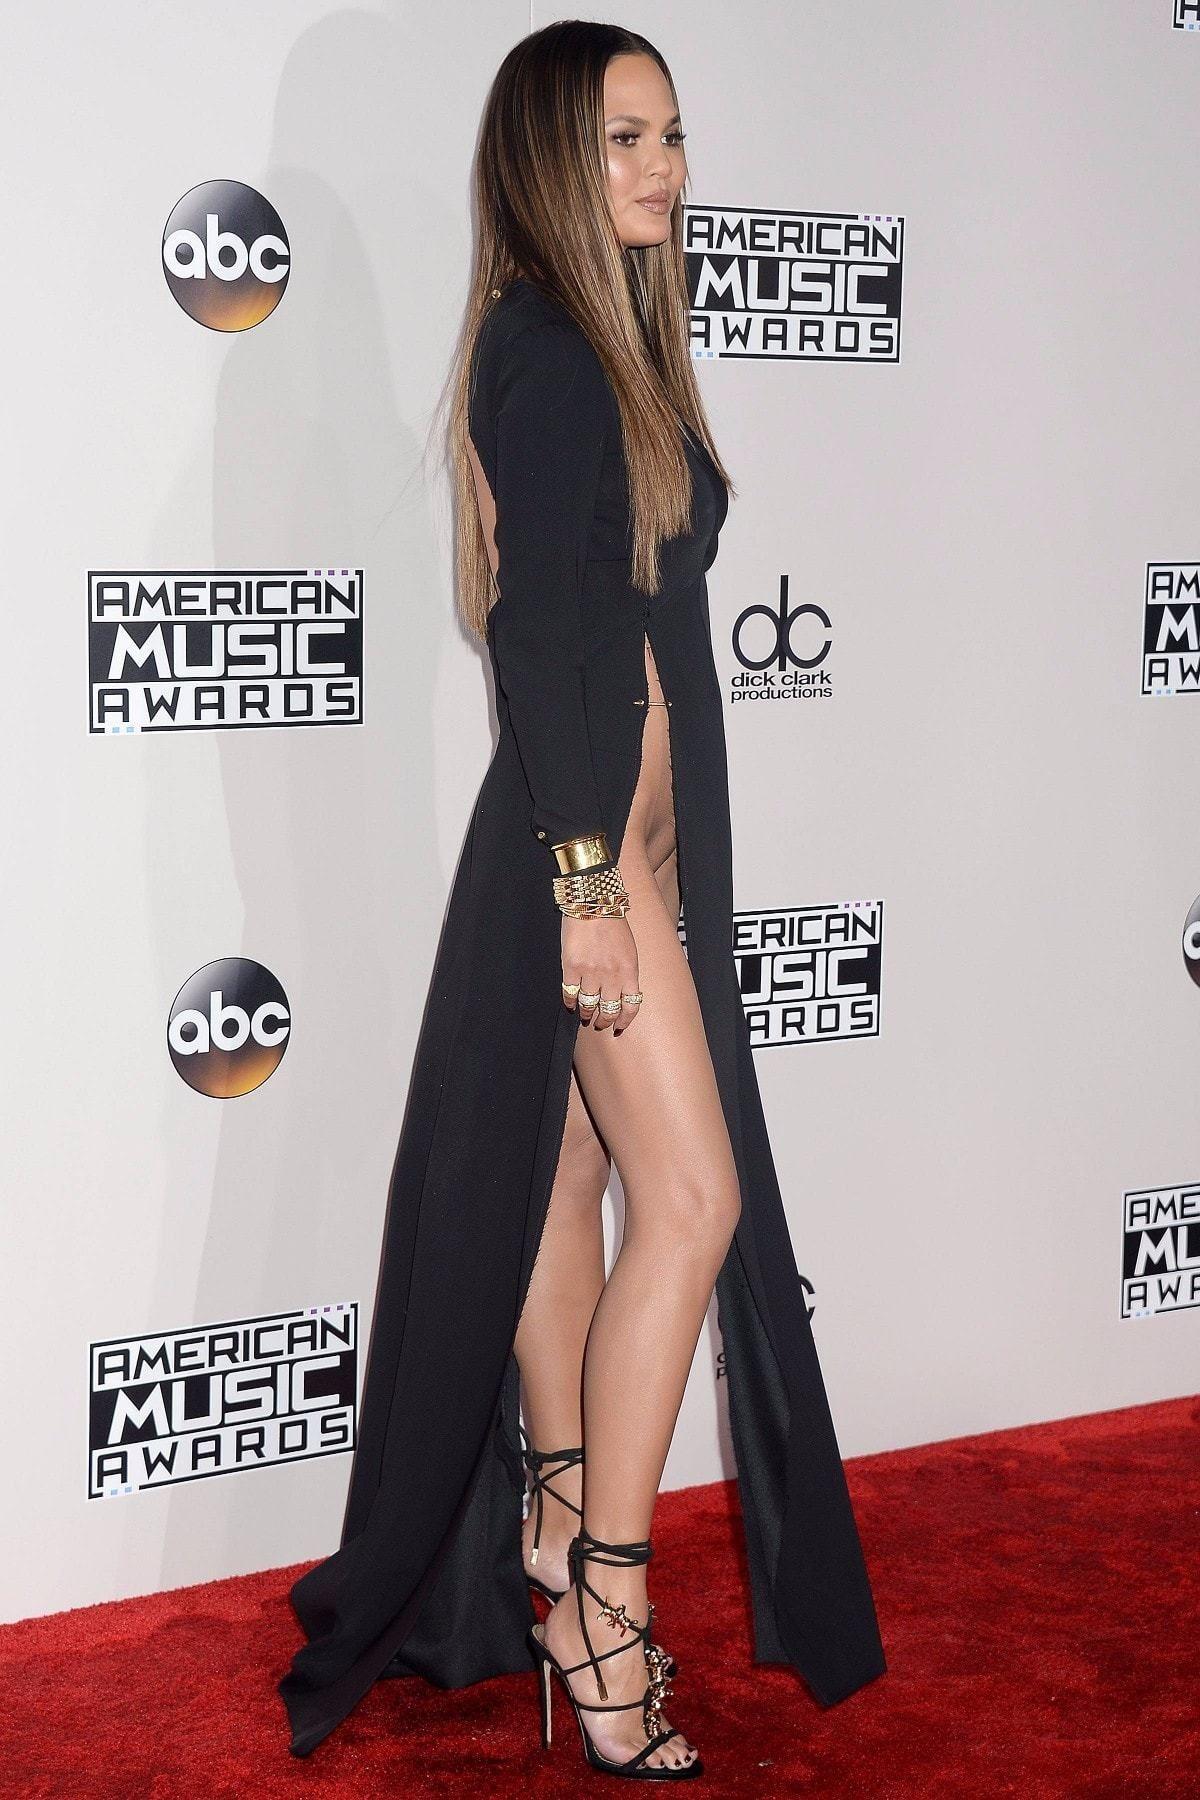 Nude photos of Christina Teigen. 2018-2019 celebrityes photos leaks! nudes (68 photos), Boobs Celebrity pic